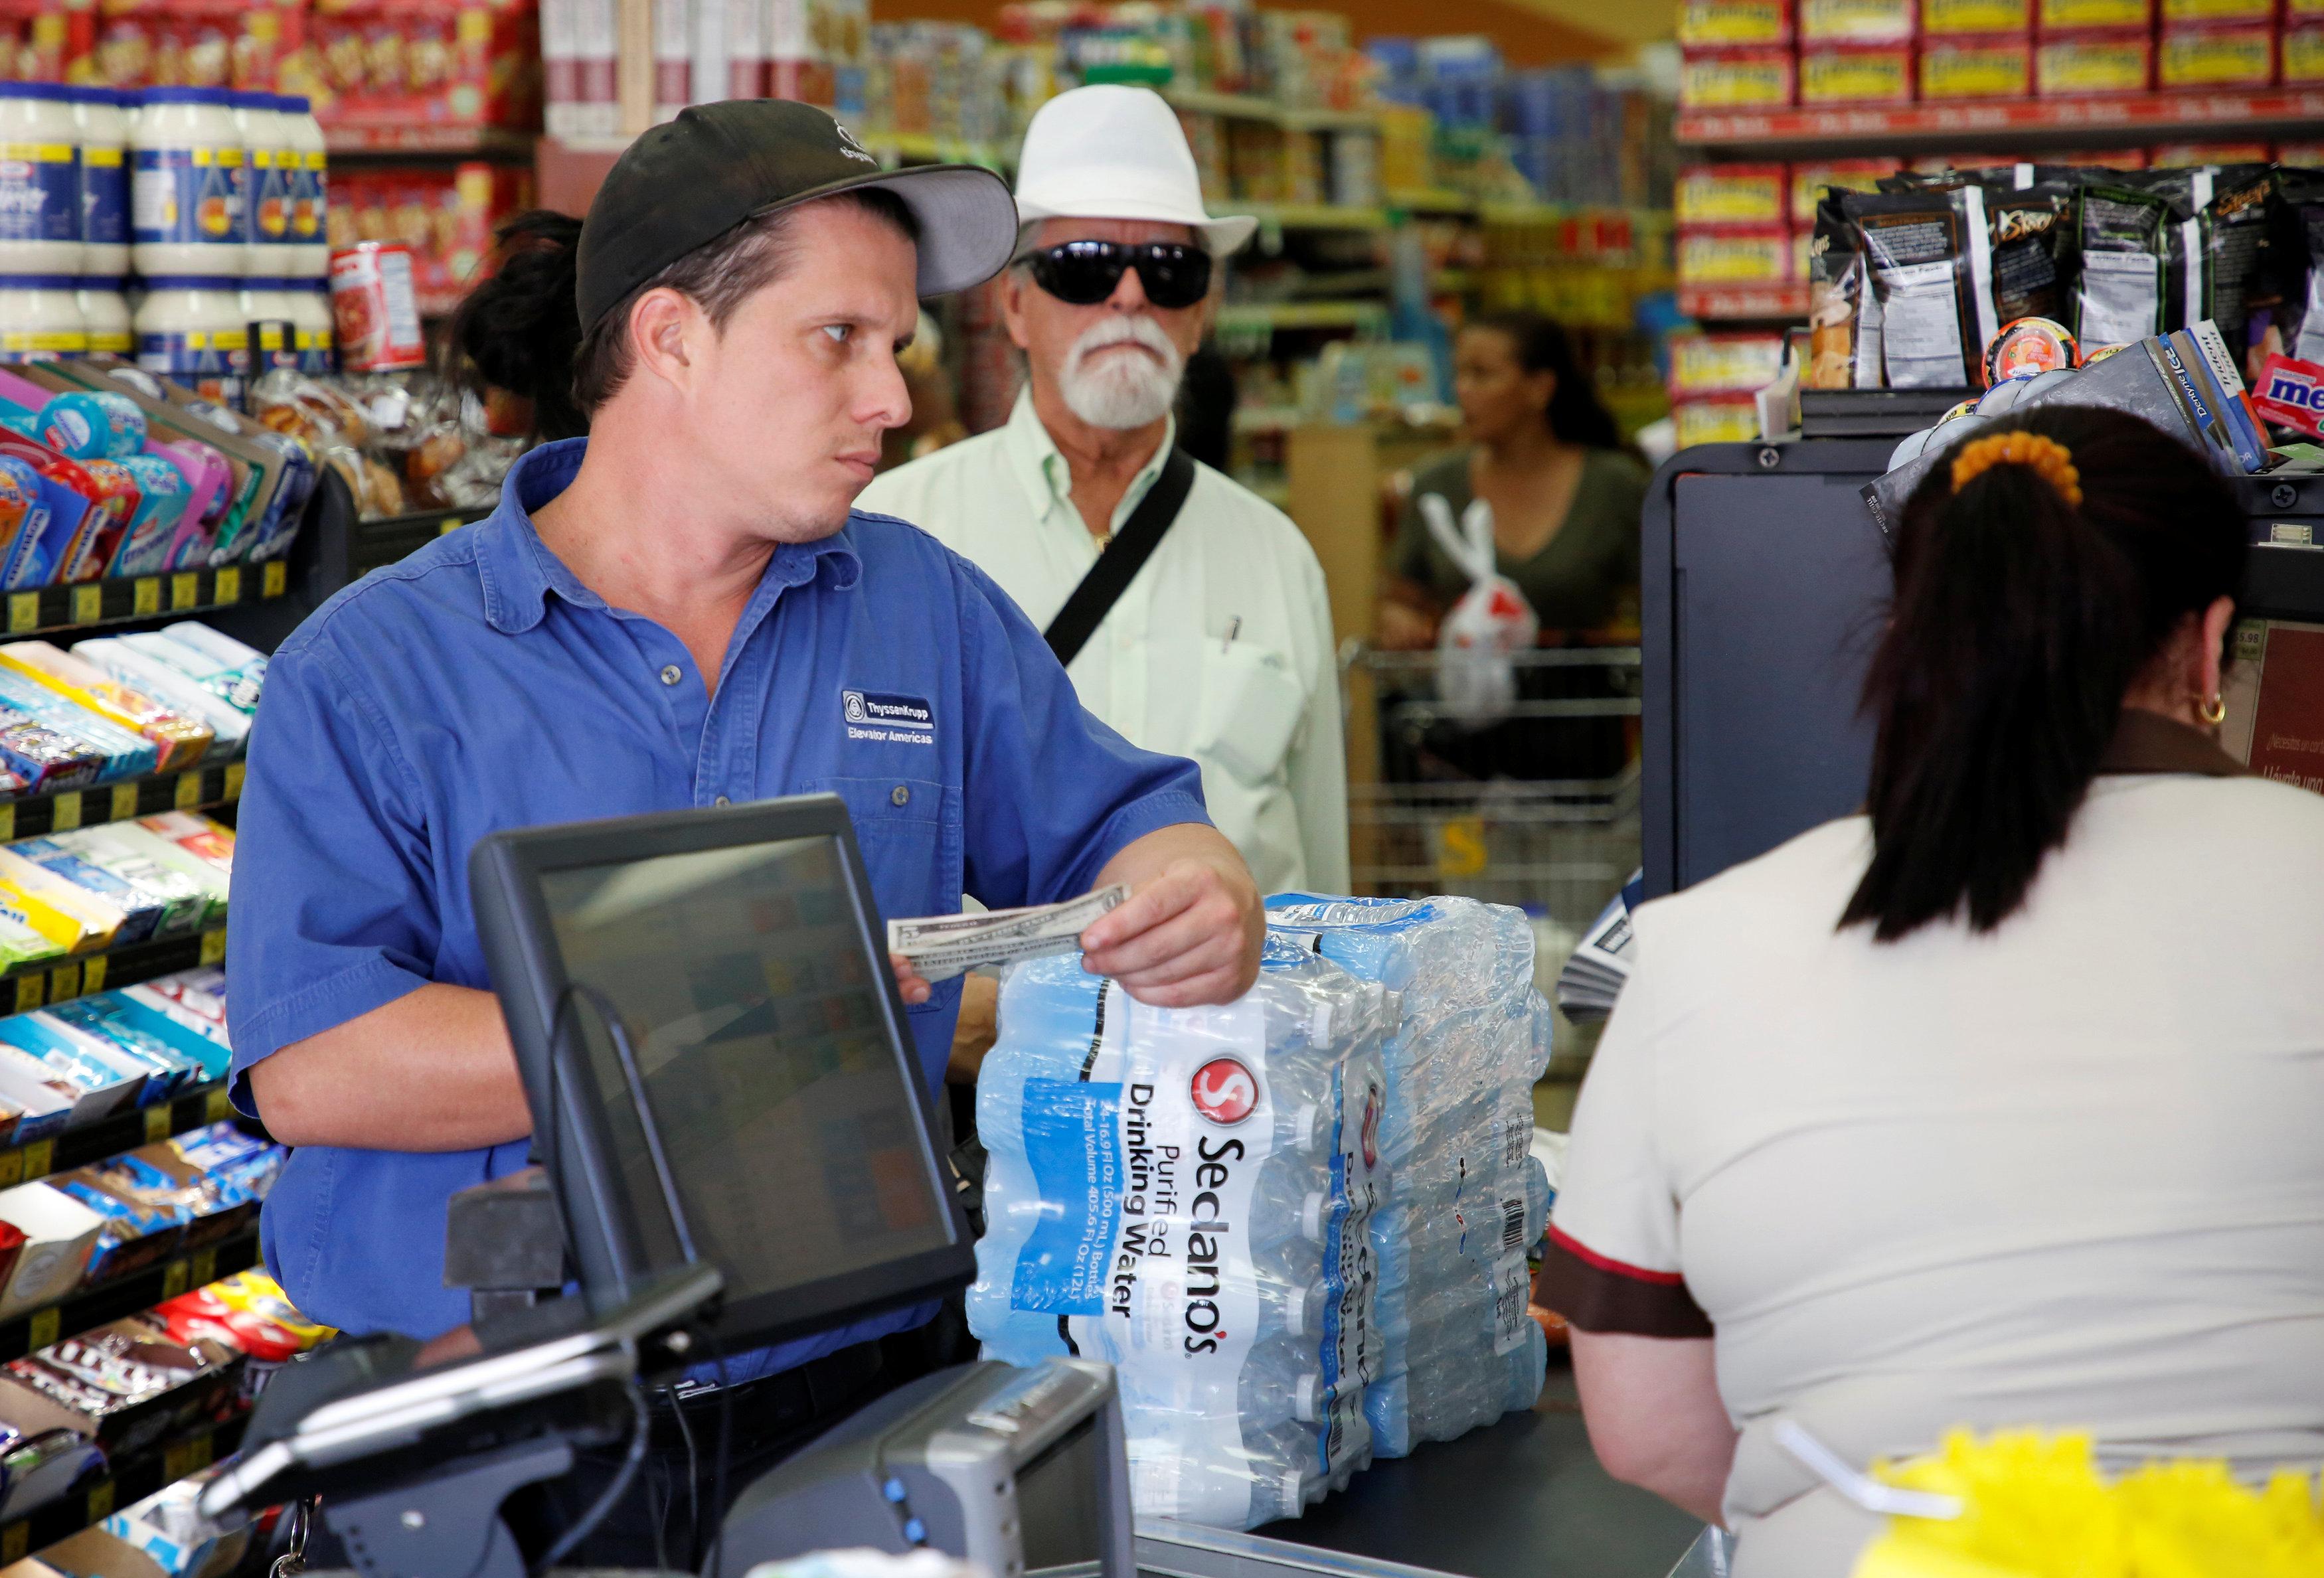 A shopper waits to purchase water in Sedano's Supermarket in the Little Havana neighborhood in Miami, Florida on Sept. 5, 2017.  (REUTERS/Joe Skipper)